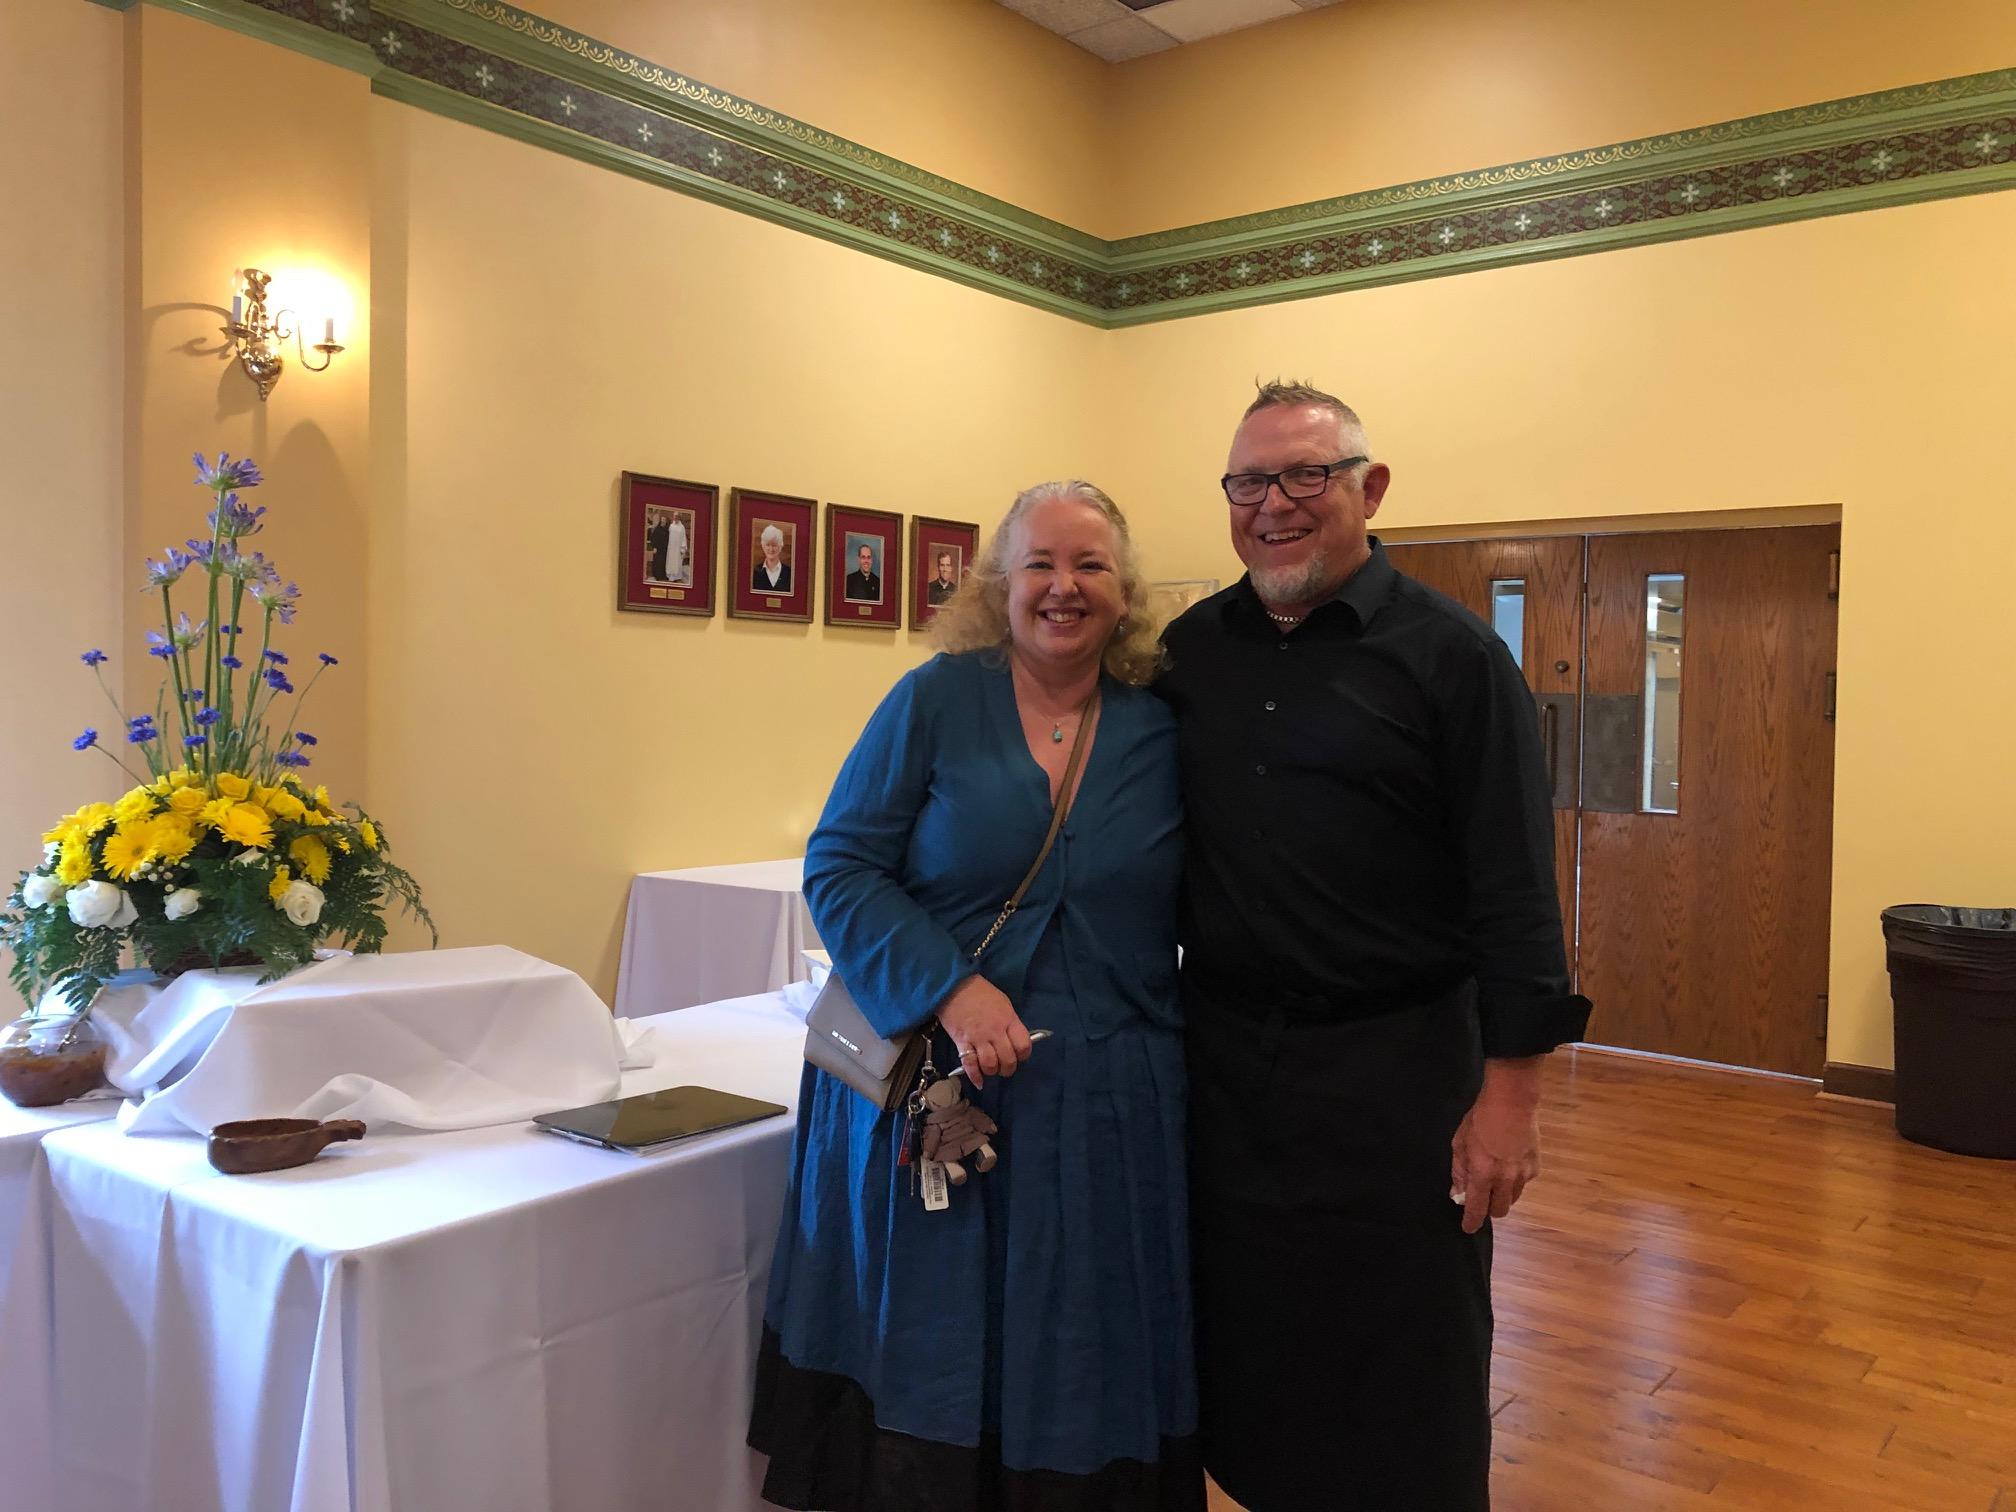 Auction chair Juliet Weenink-Griffiths & Chorus President Bill Doepkens